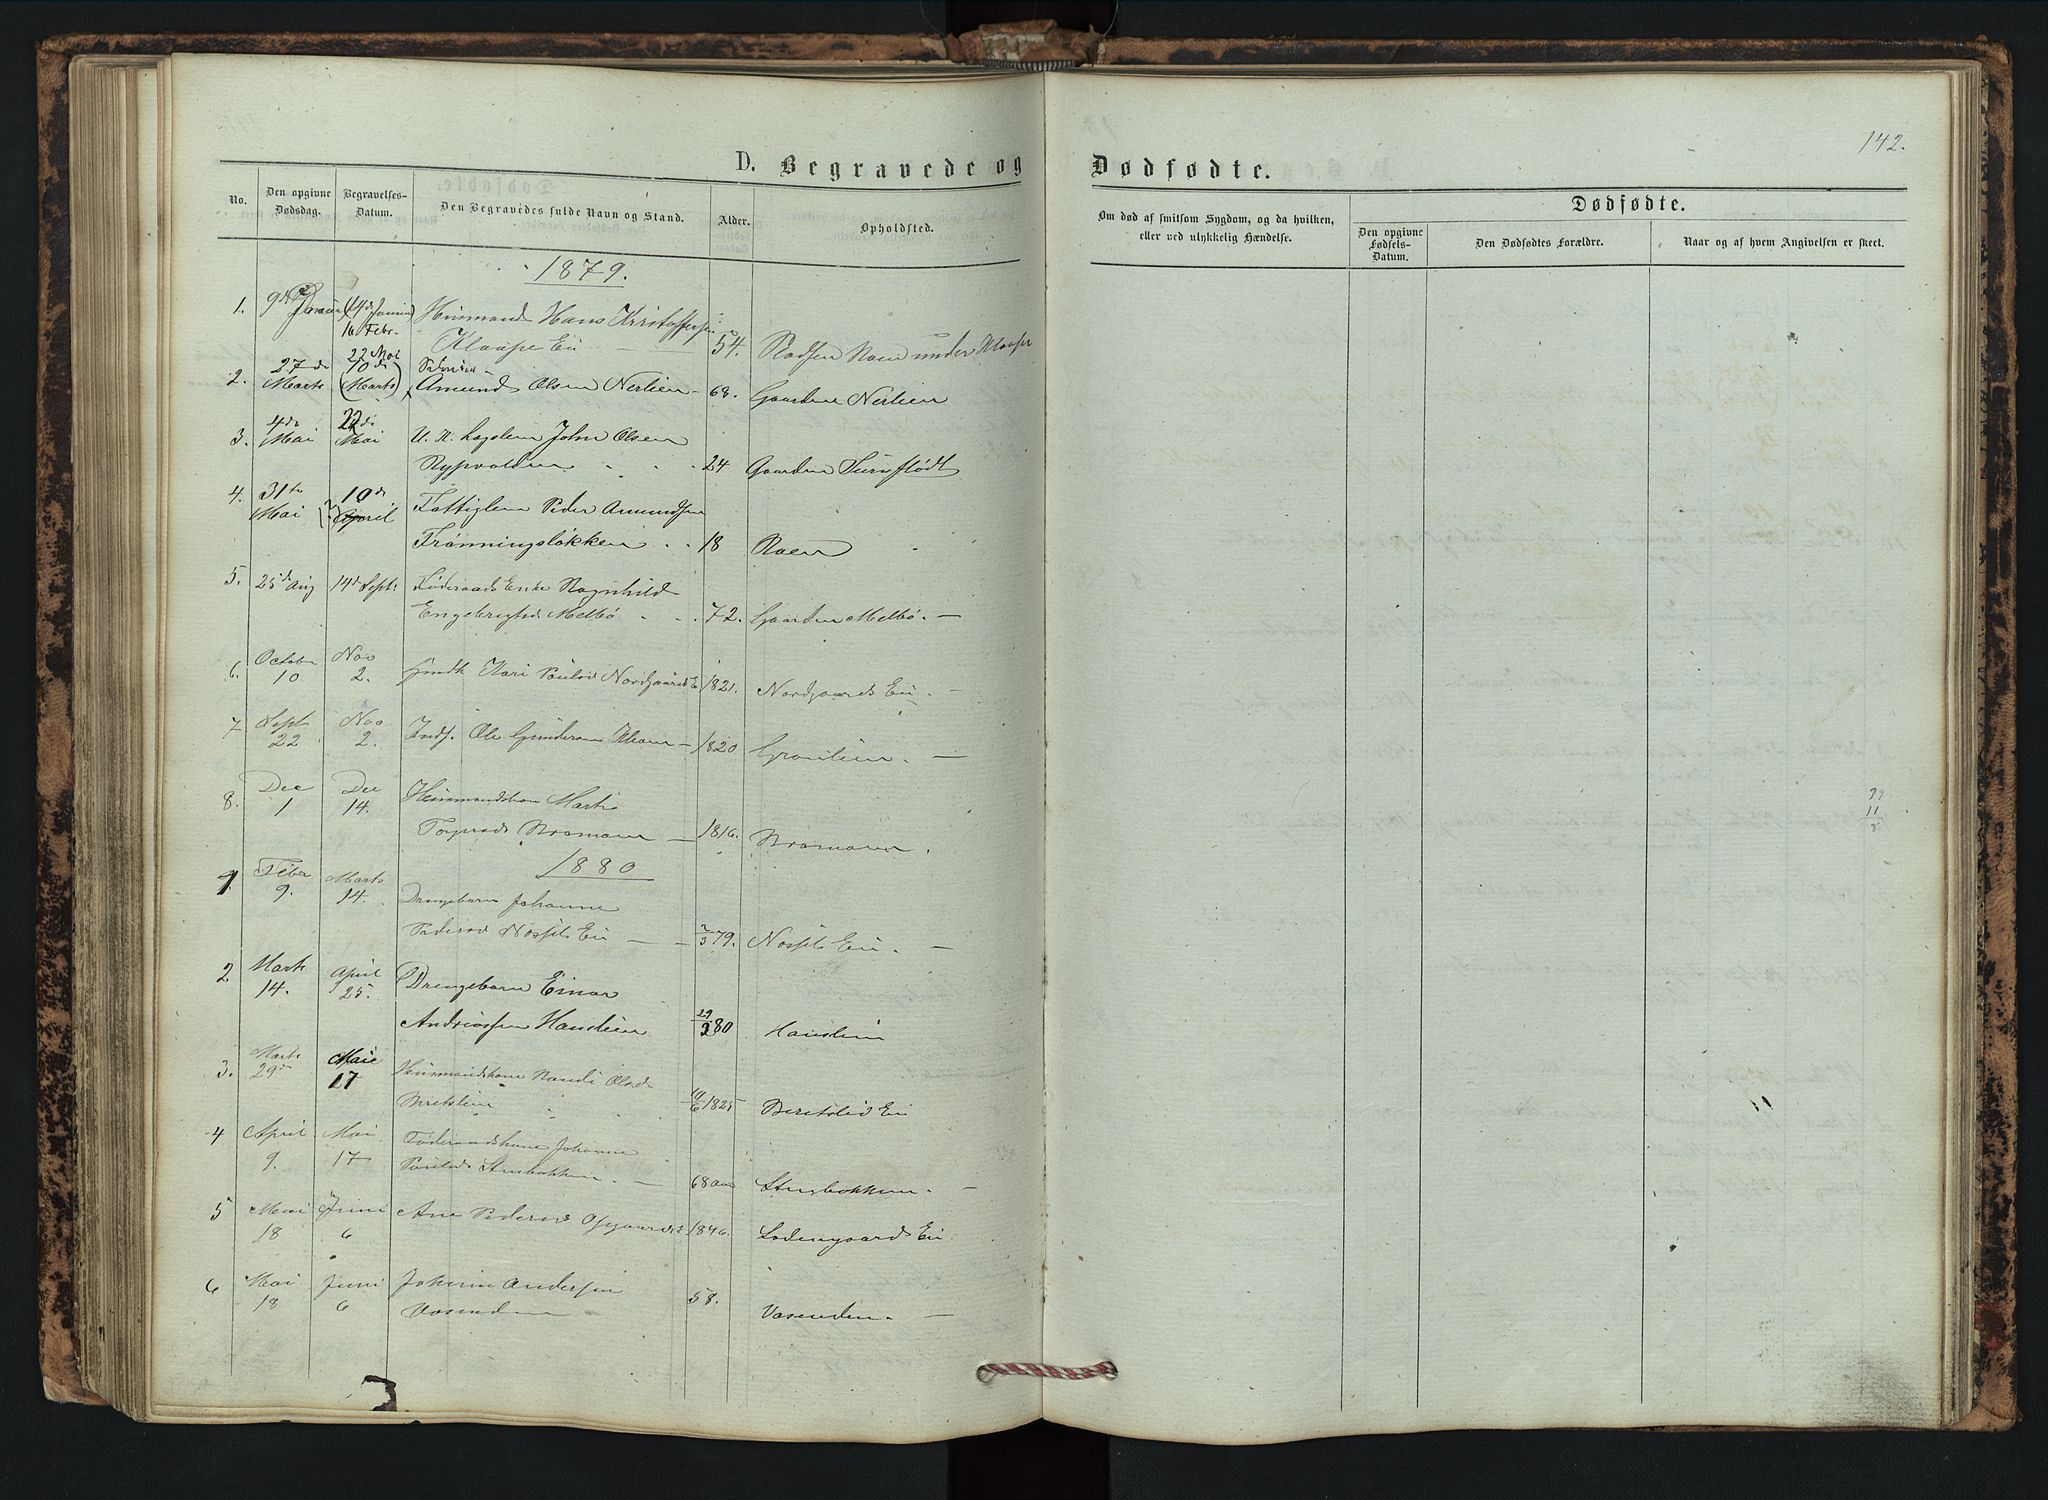 SAH, Vestre Gausdal prestekontor, Klokkerbok nr. 2, 1874-1897, s. 142